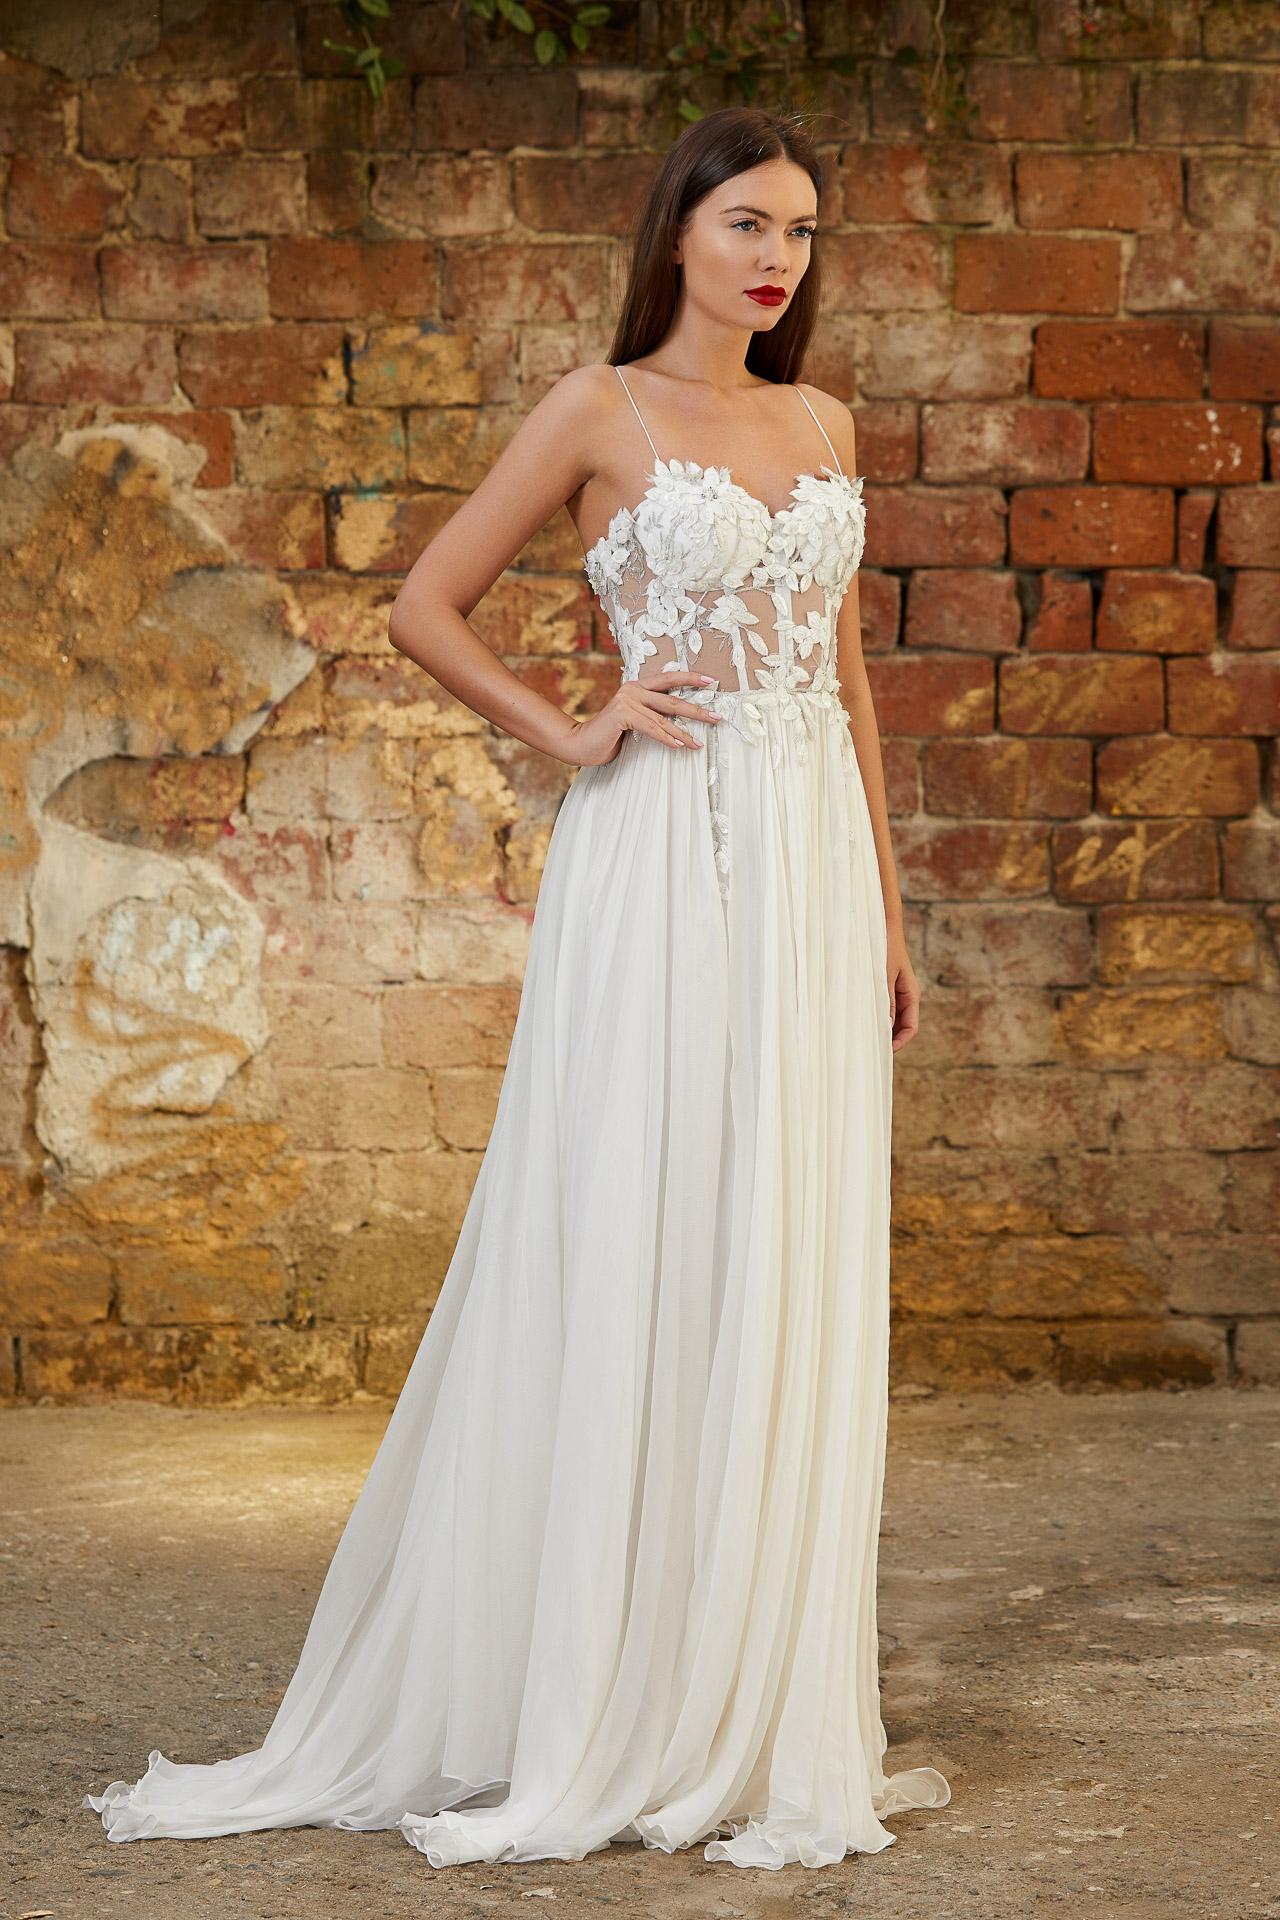 Embellished silk wedding gown